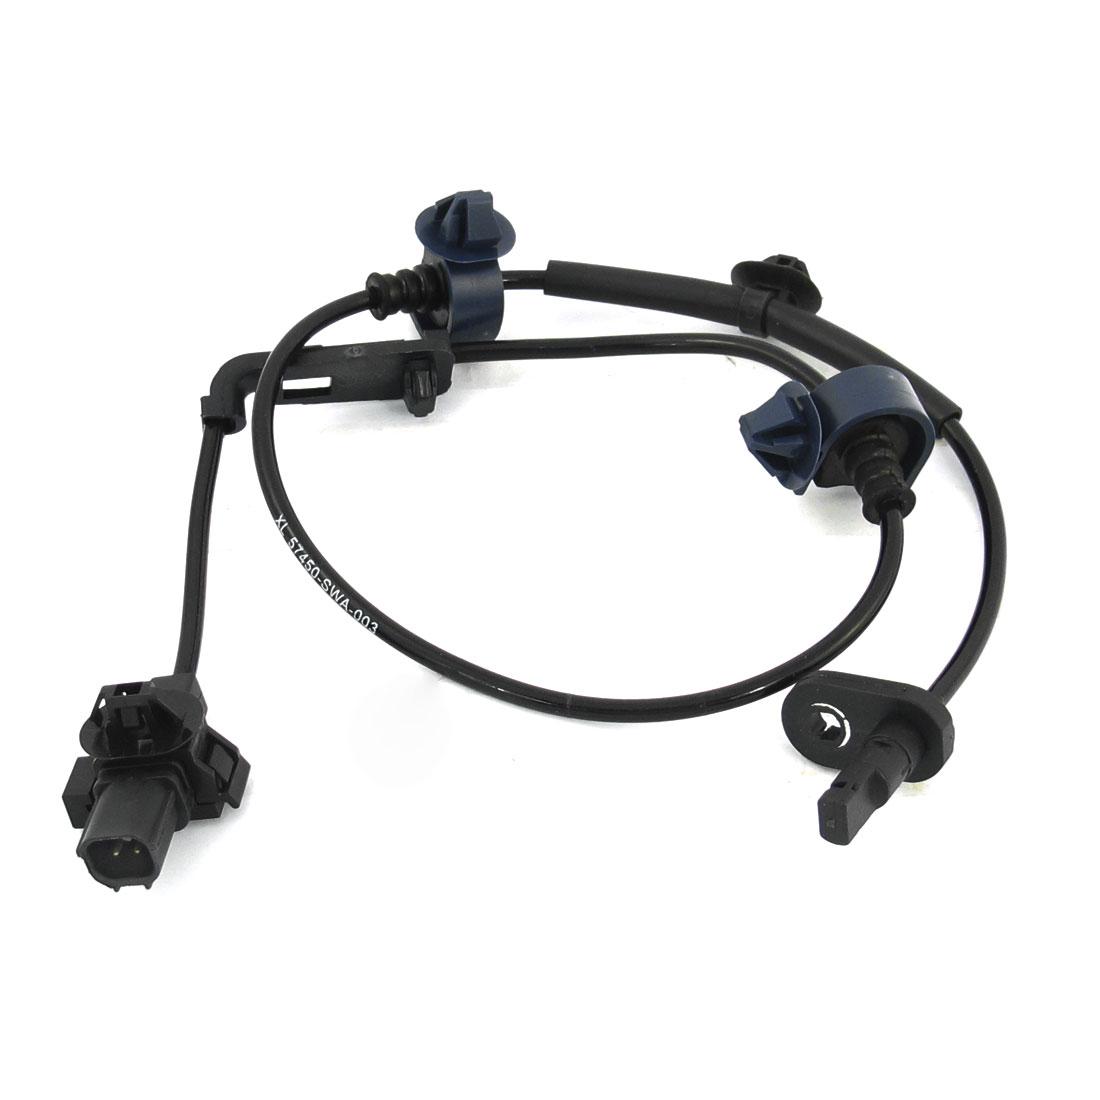 New Rear Right ABS Sensor Wheel Speed Fits Anti-Lock System 57470-SWA-003